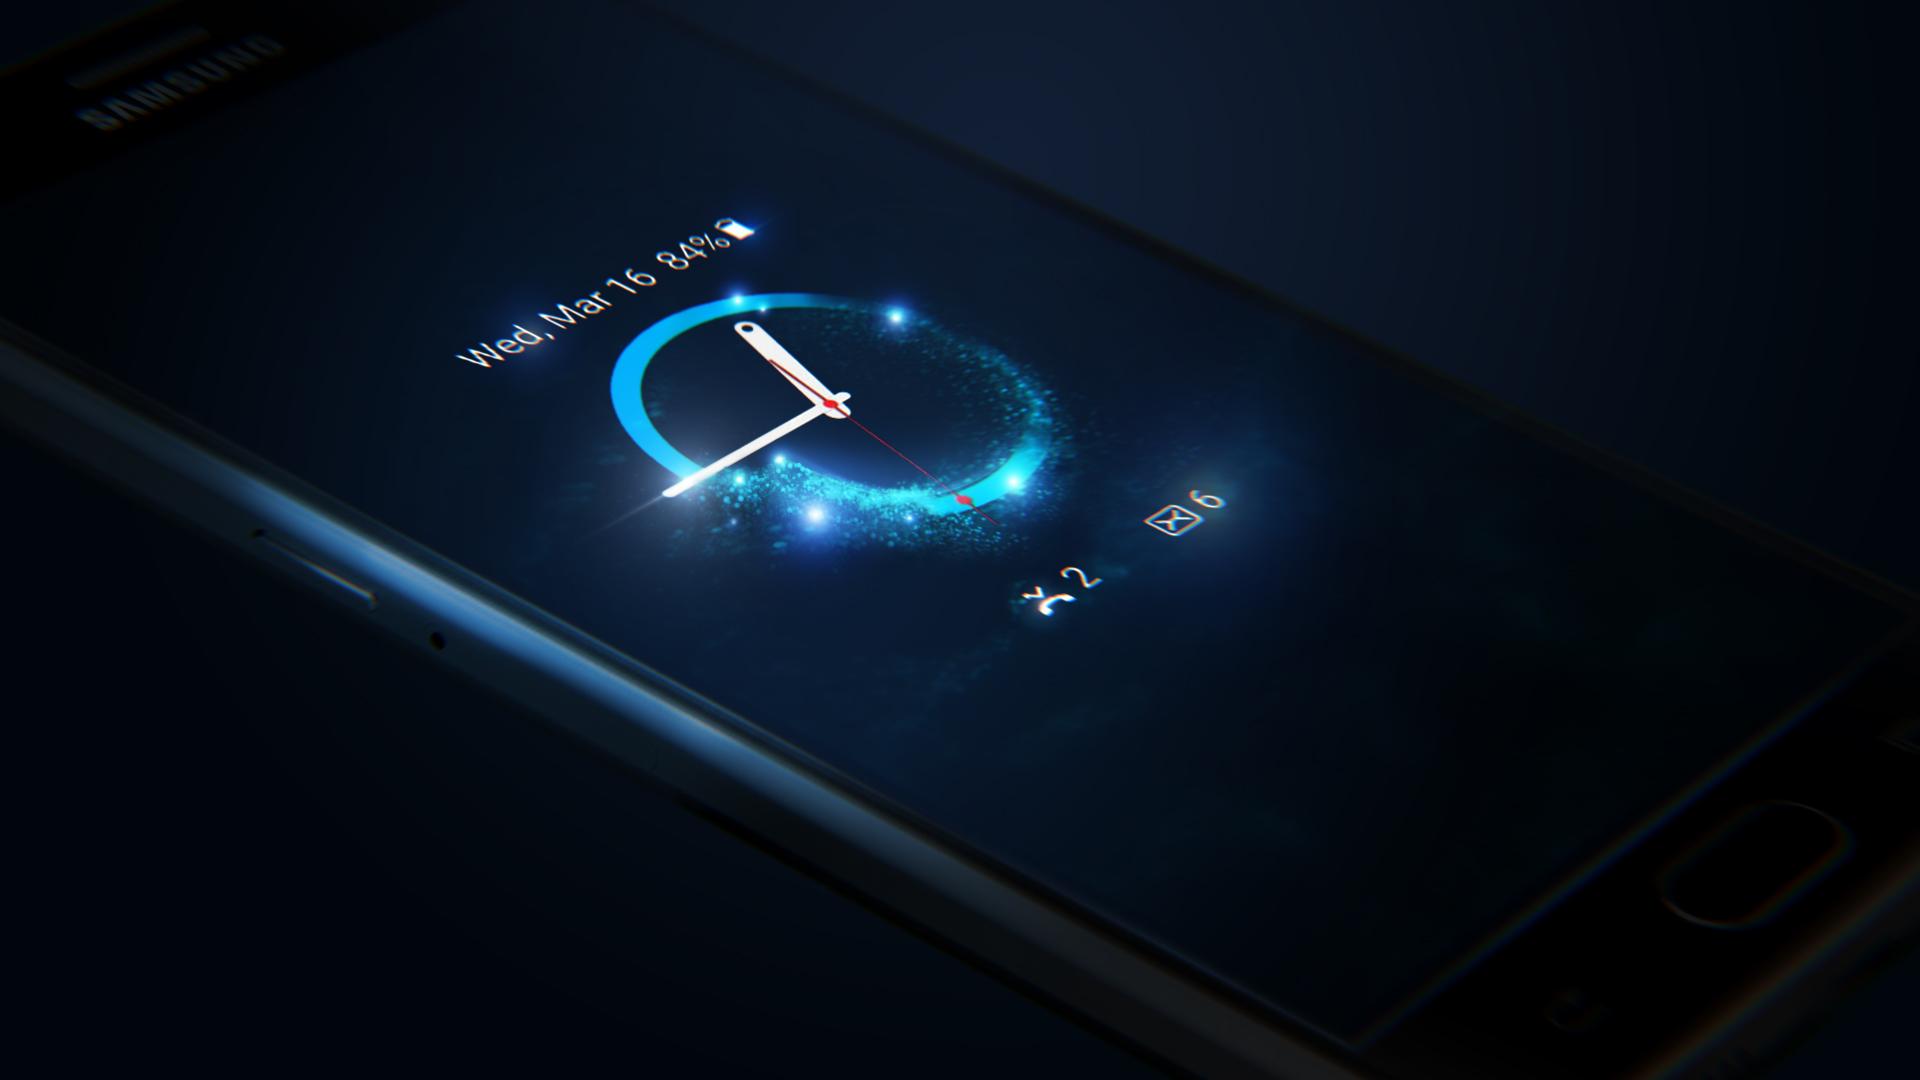 Galaxy_S7_Design_Treated_F07_alt.jpg